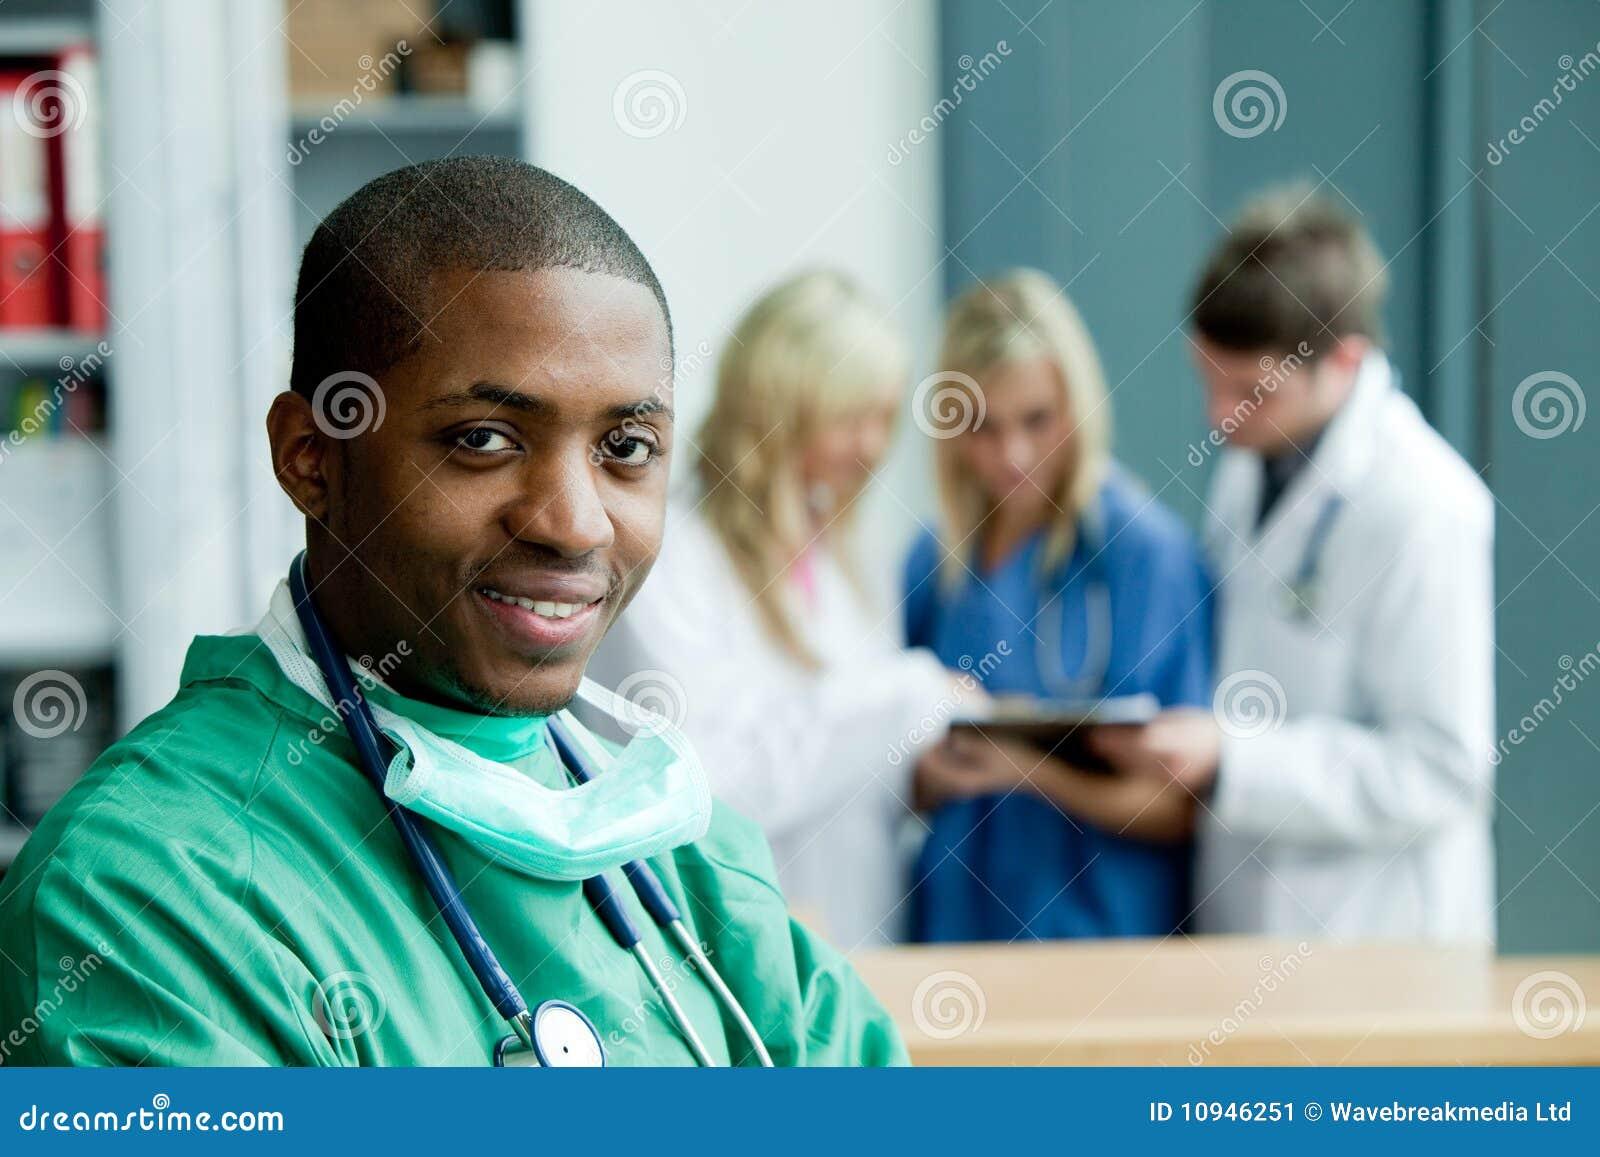 Ethnic hospital smiling surgeon